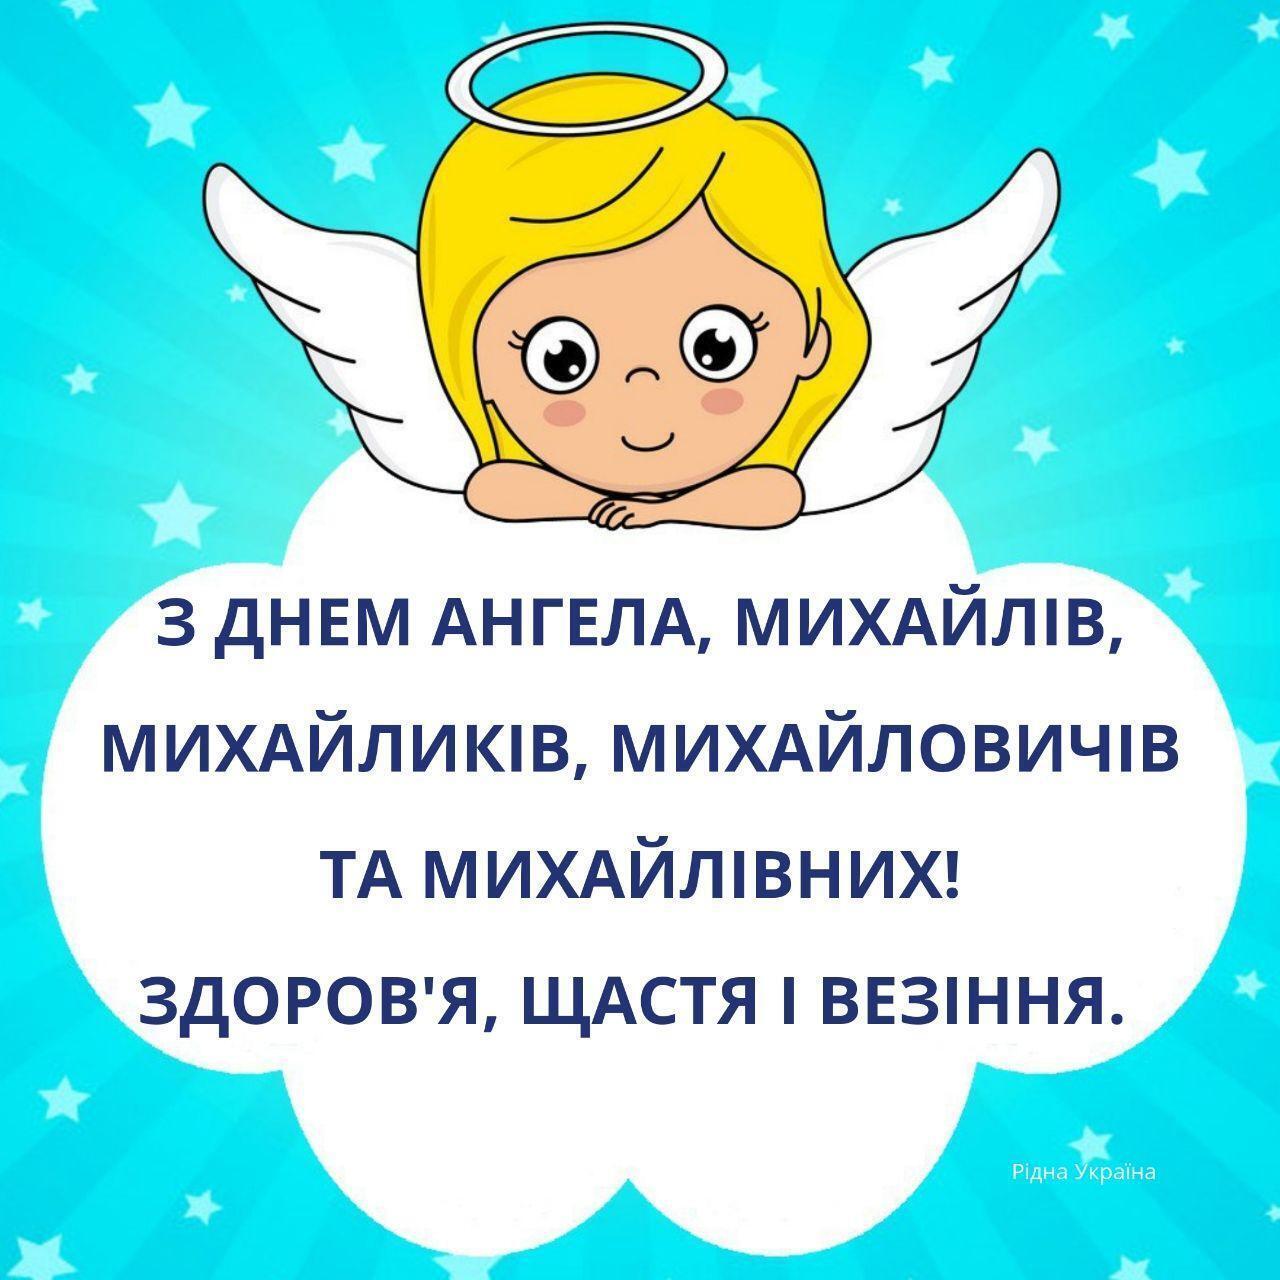 Картинка ко дню ангела Михаила